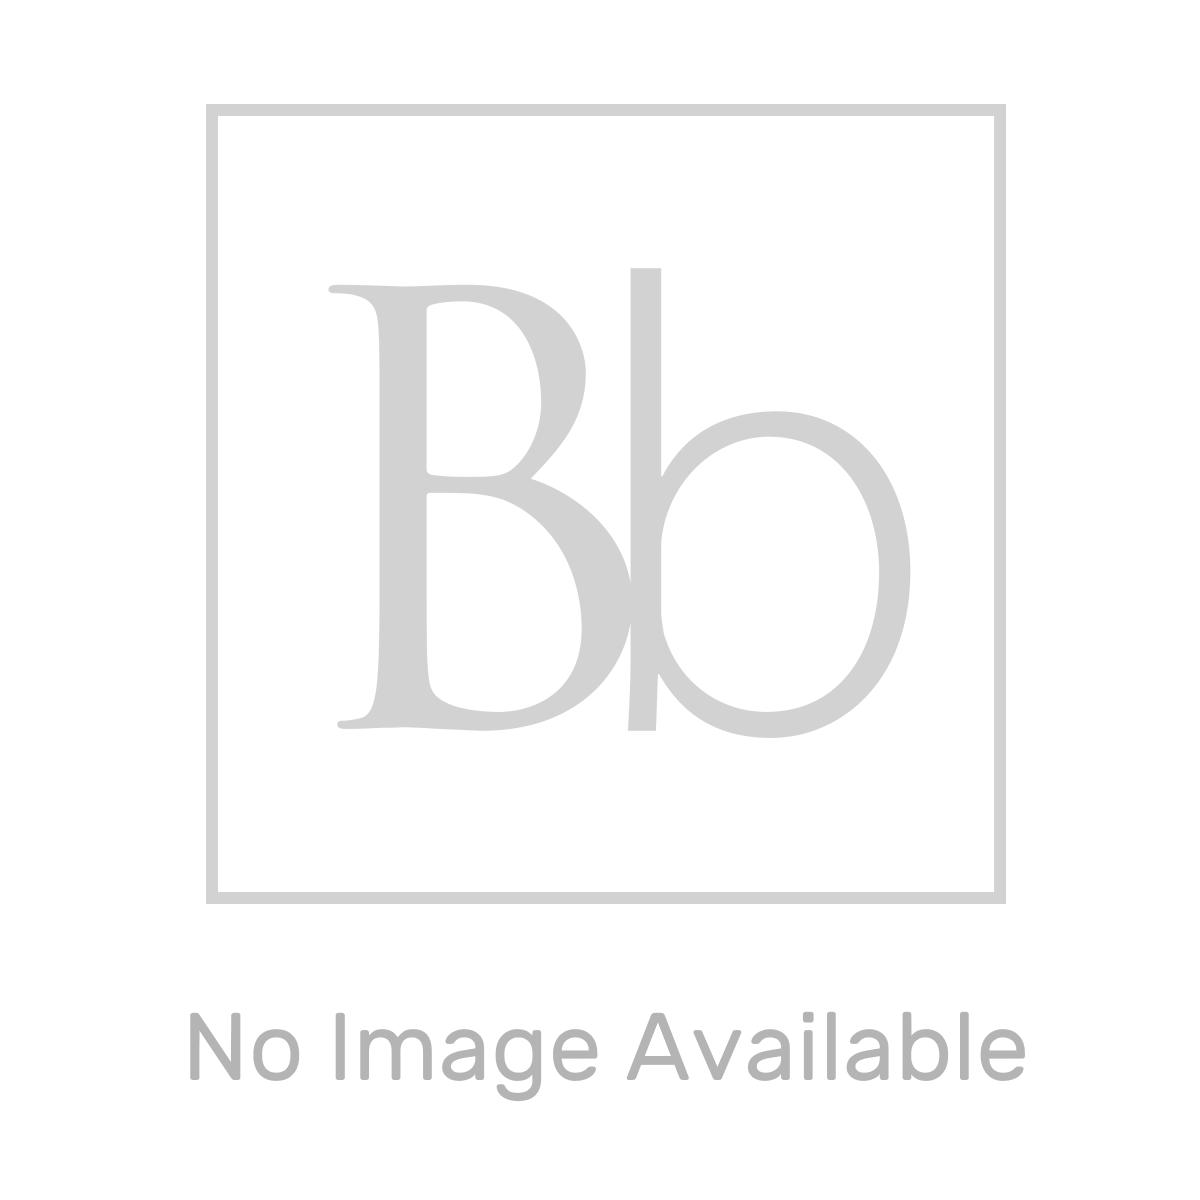 Frontline Aquaglass Onyx Black Sliding Shower Enclosure Inside Corner